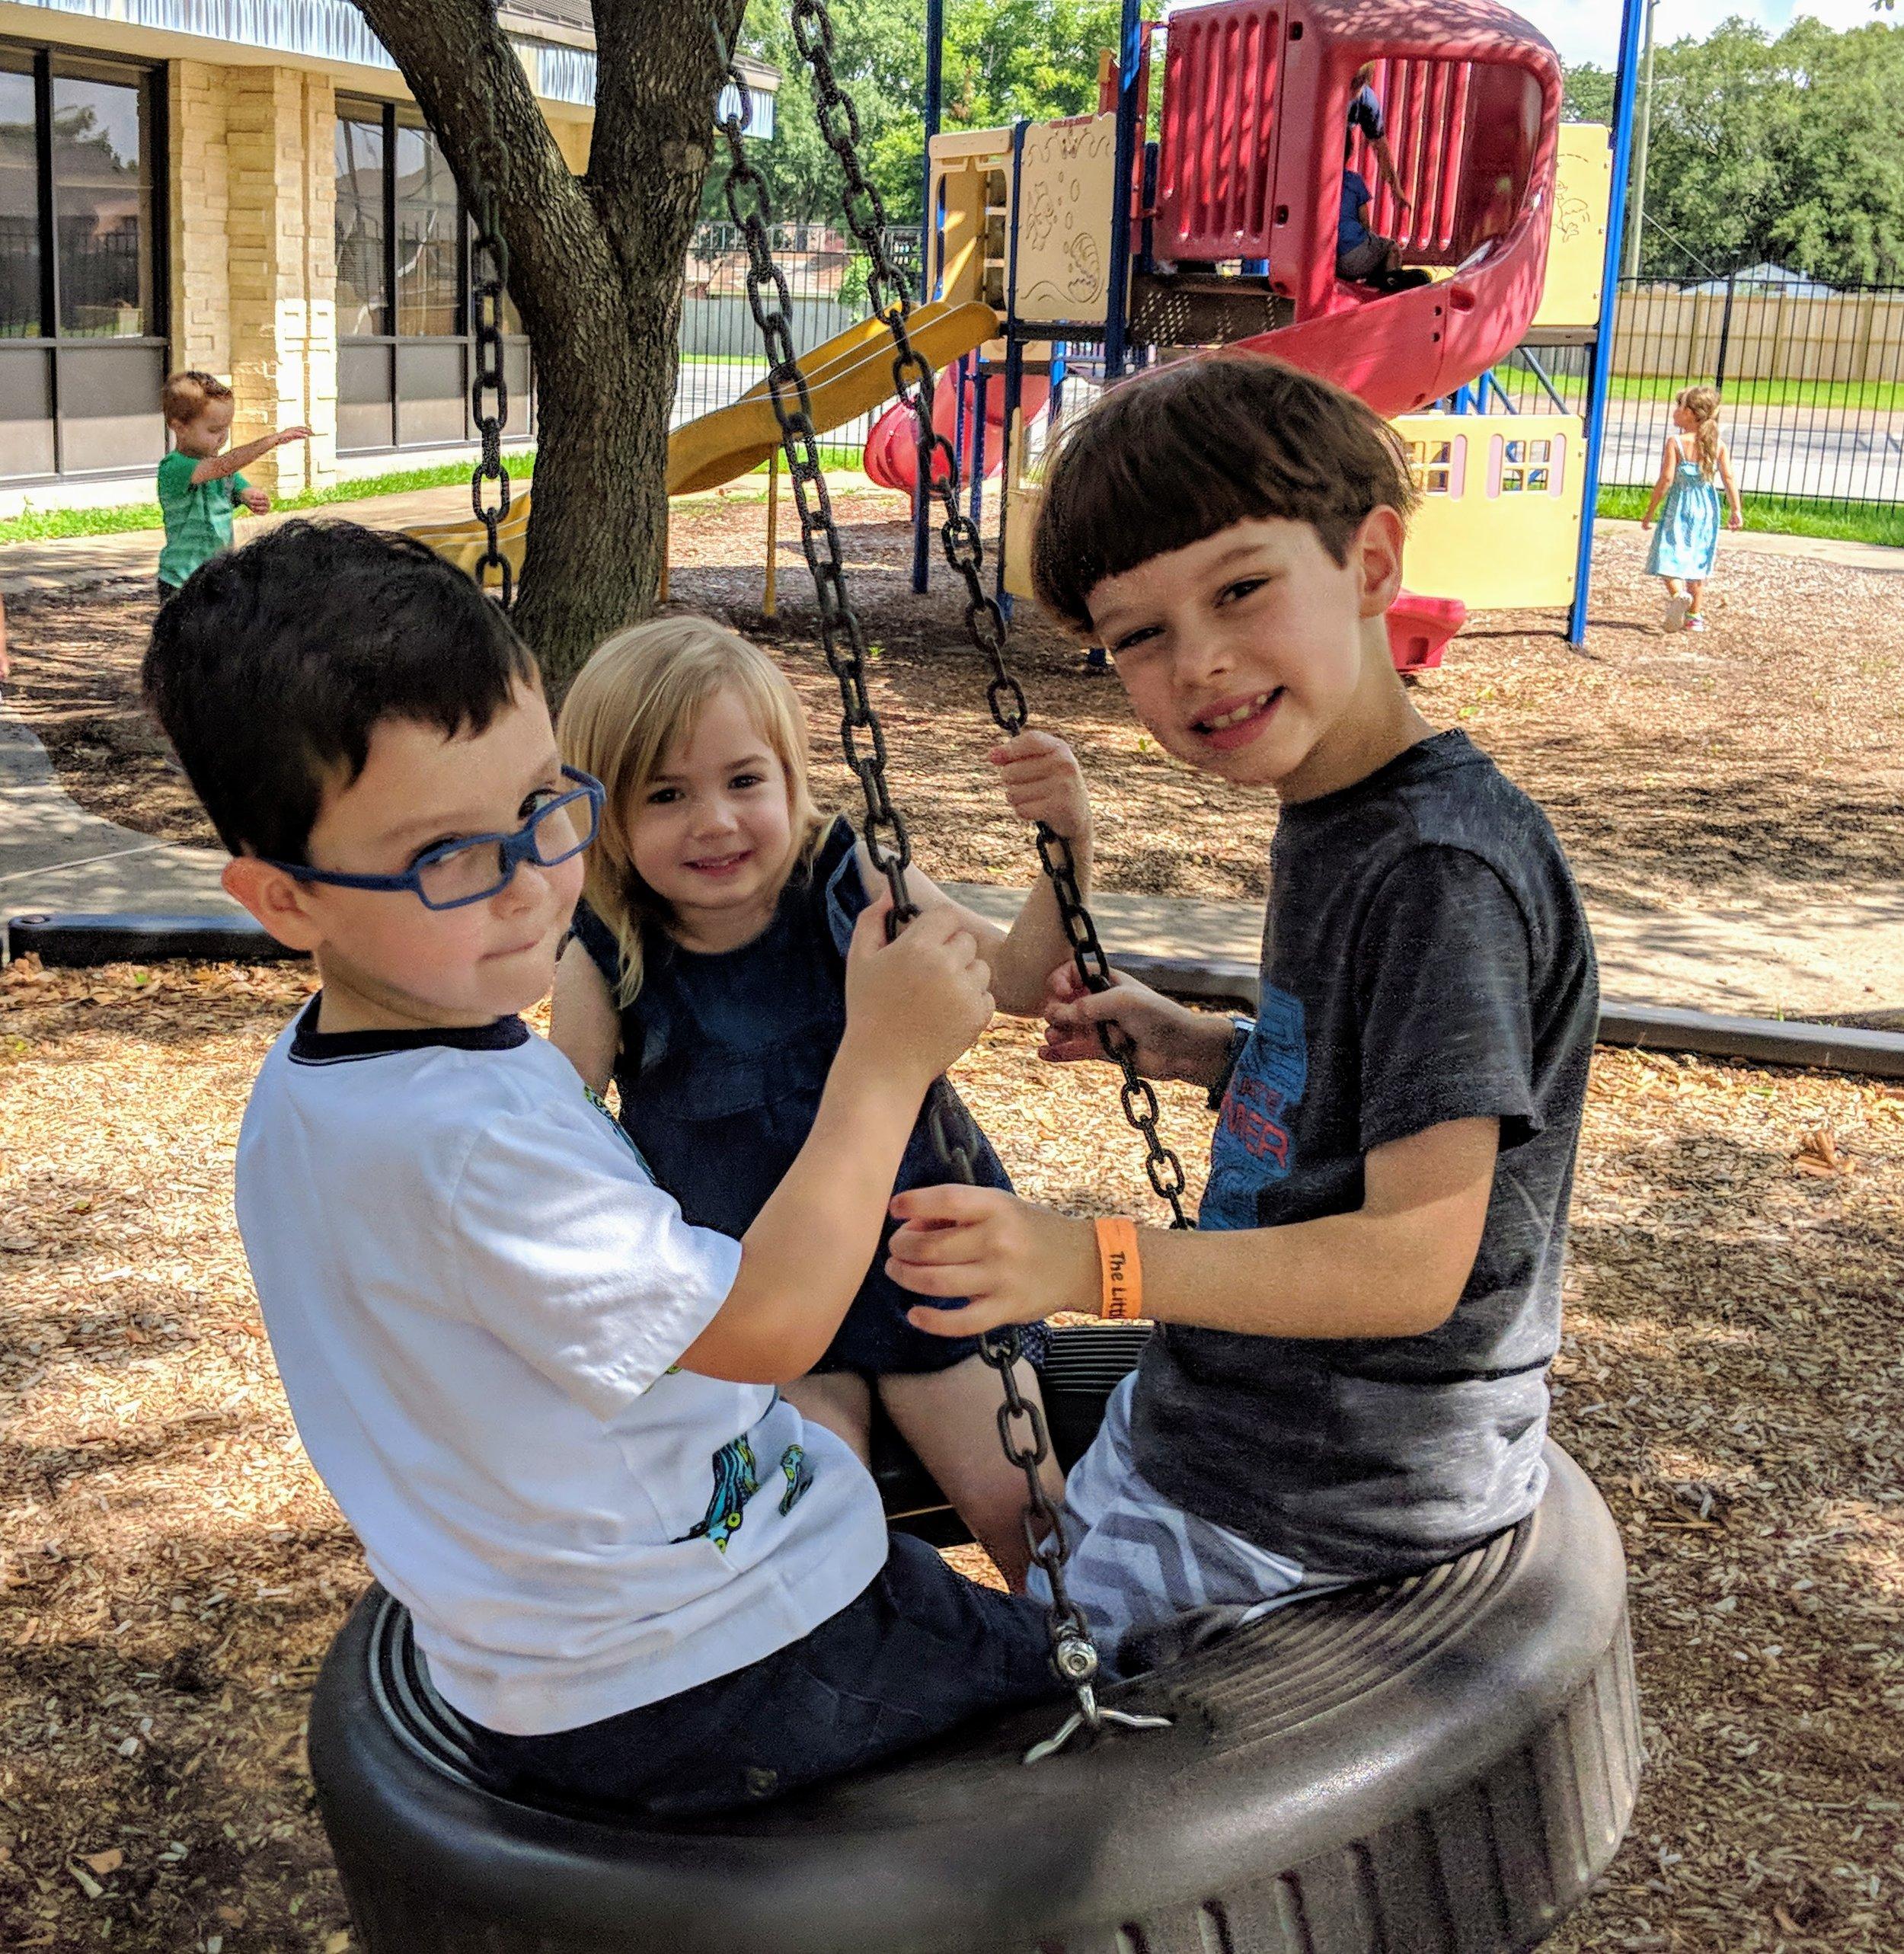 Tire swing on Preschool playground